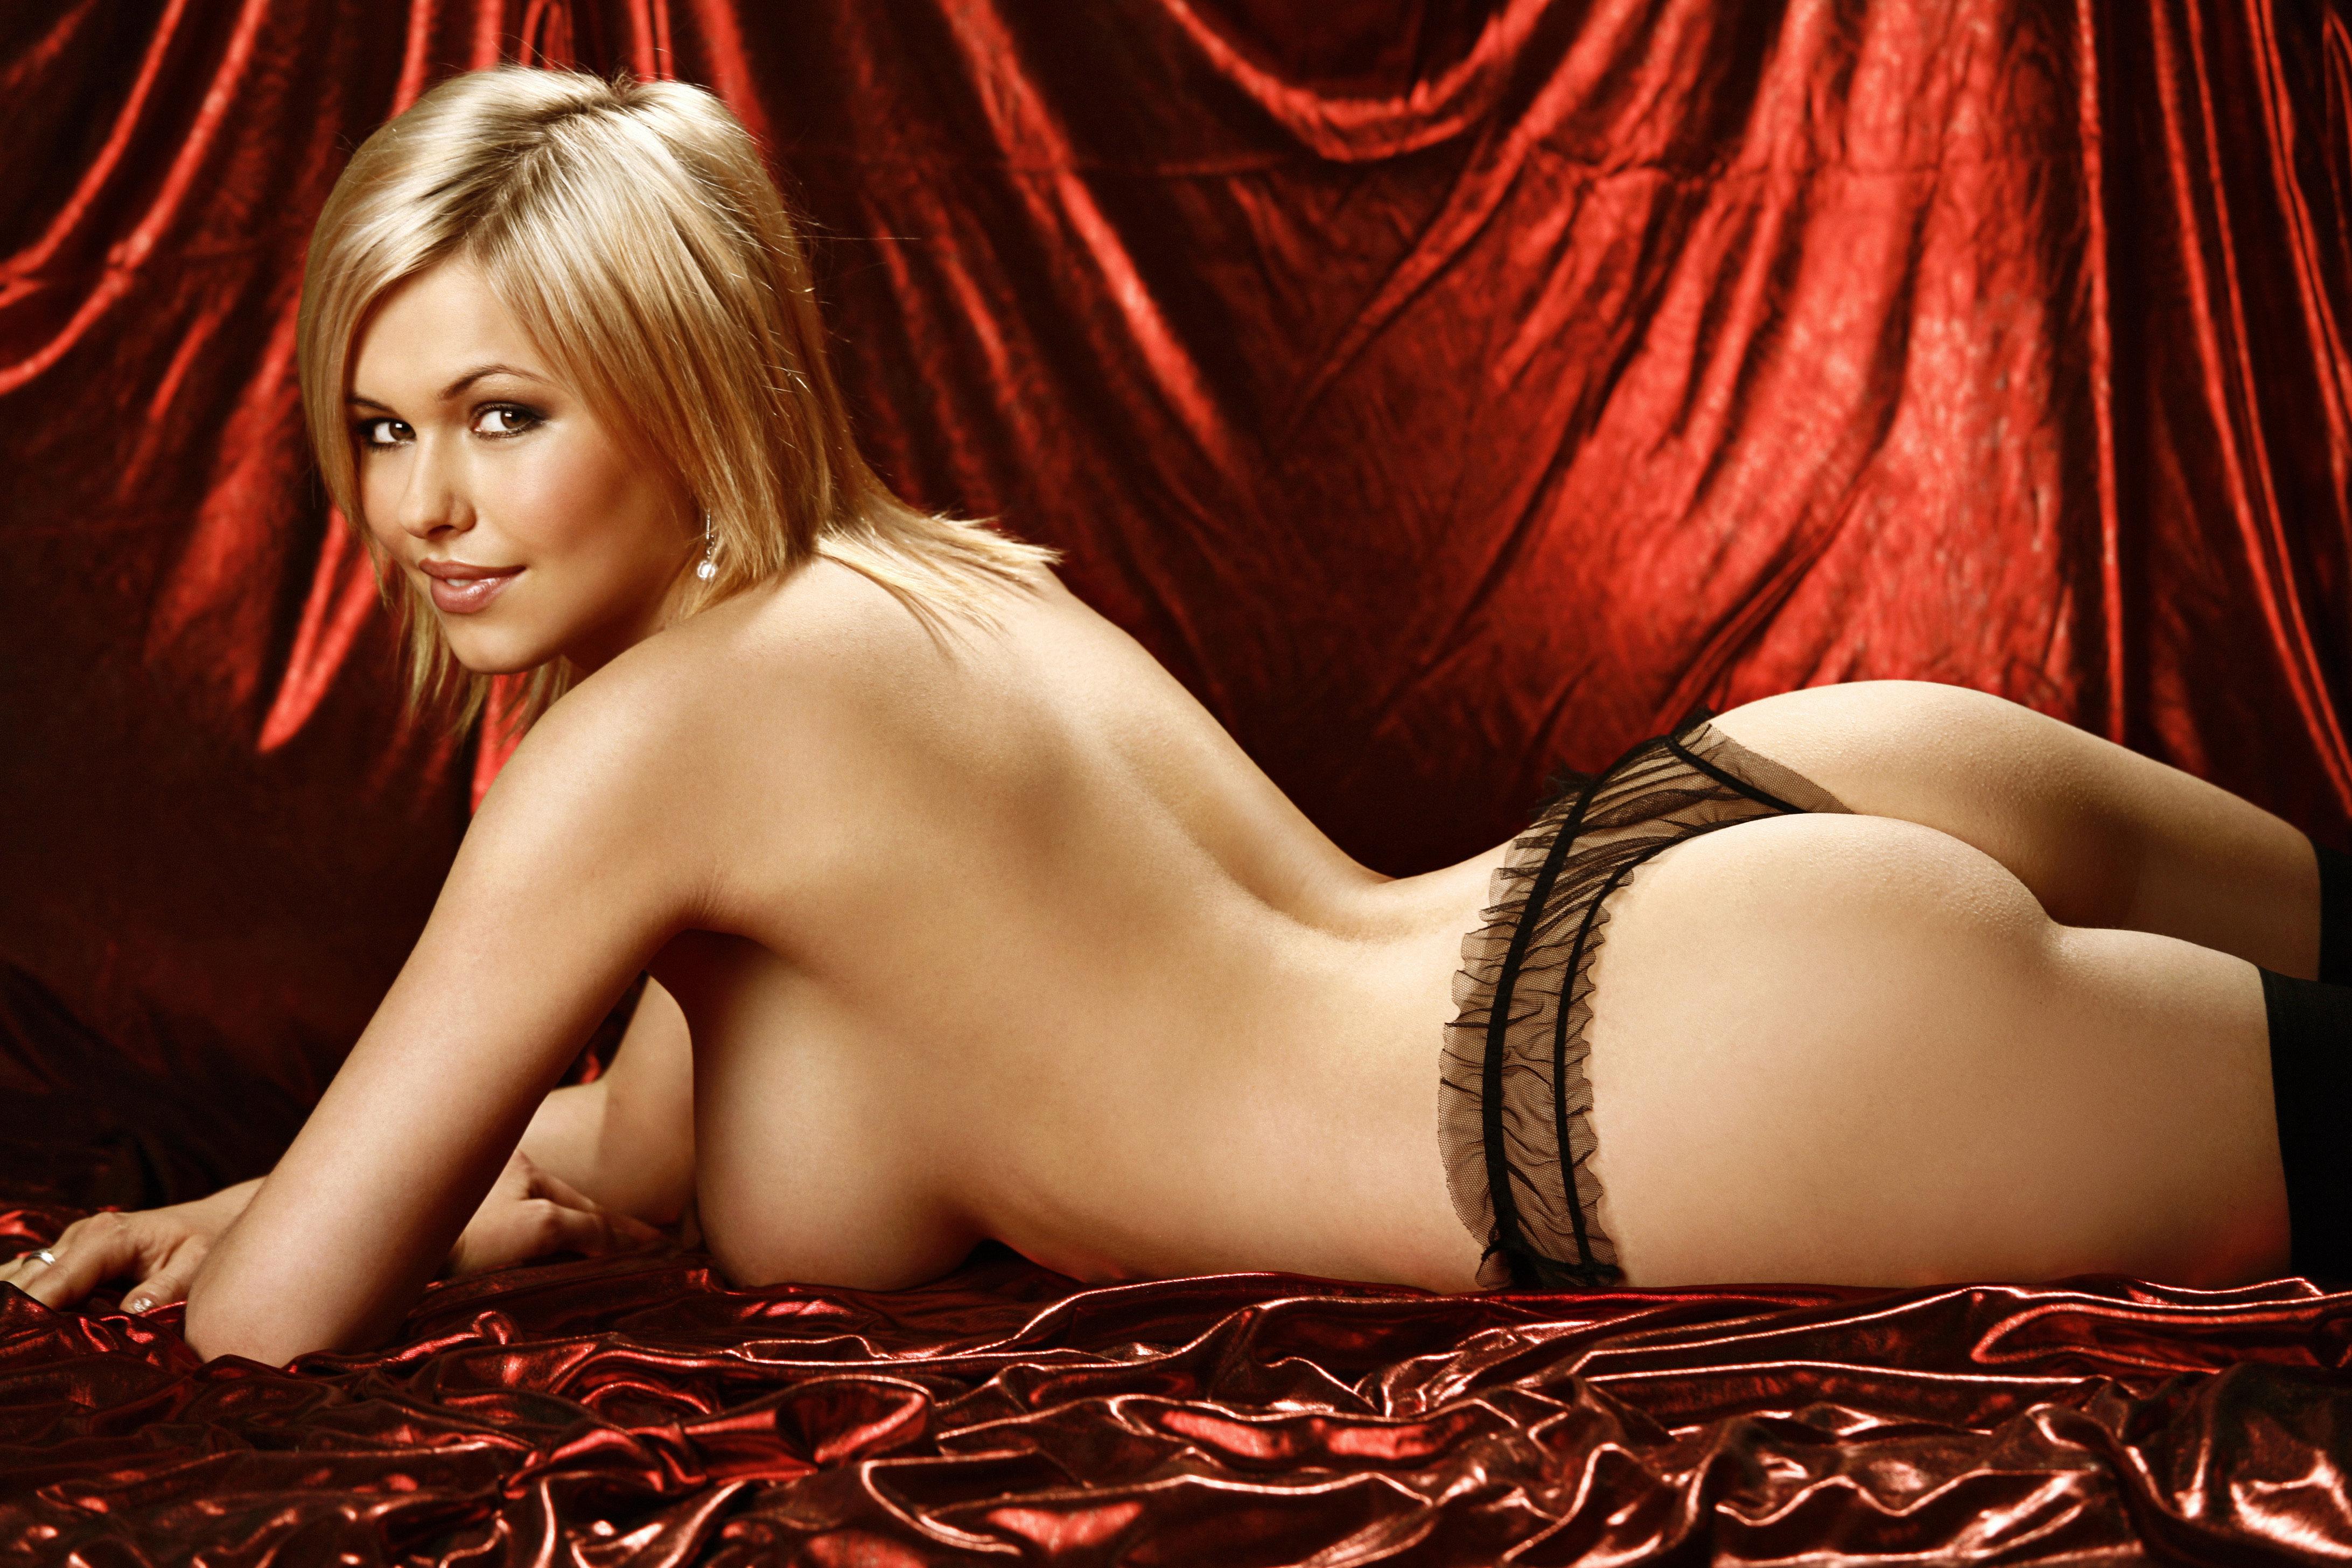 Eva wyrwal naked